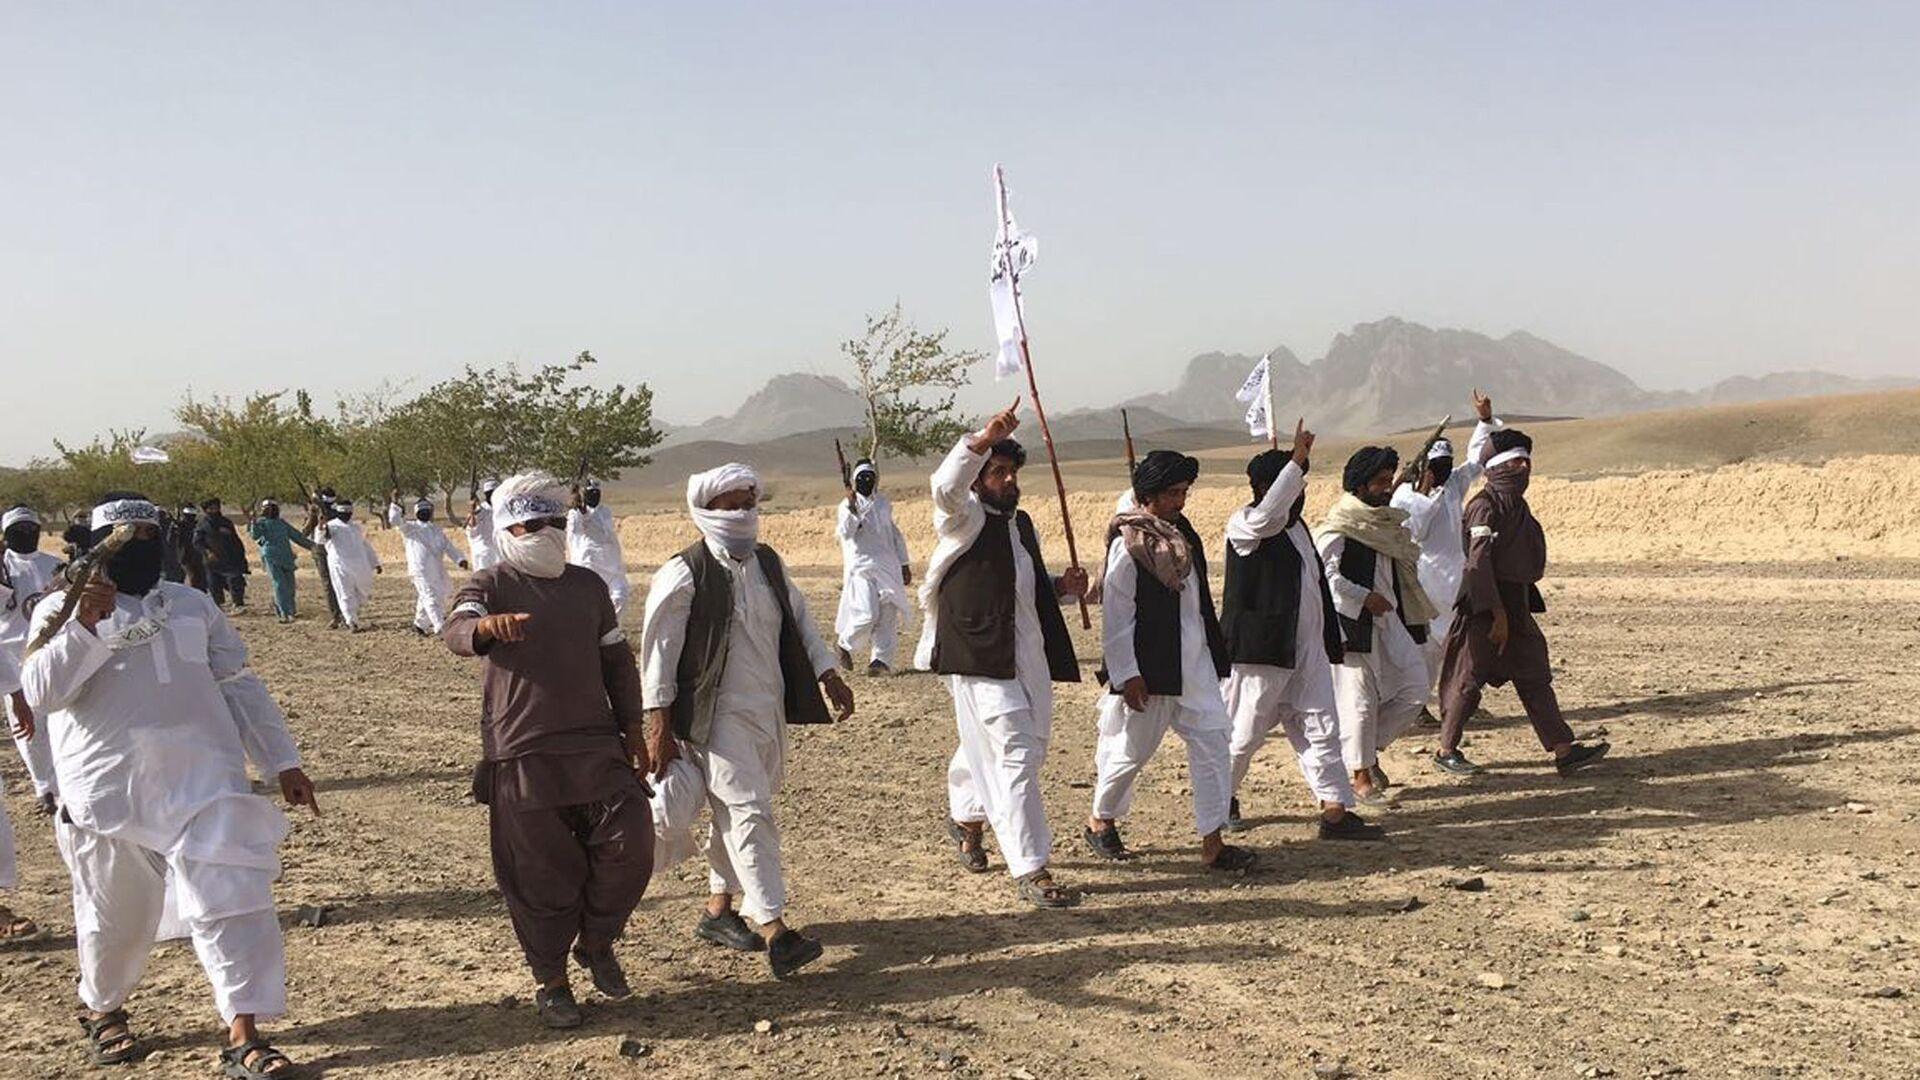 Члены террористического движения Талибан в Афганистане - Sputnik Таджикистан, 1920, 09.08.2021